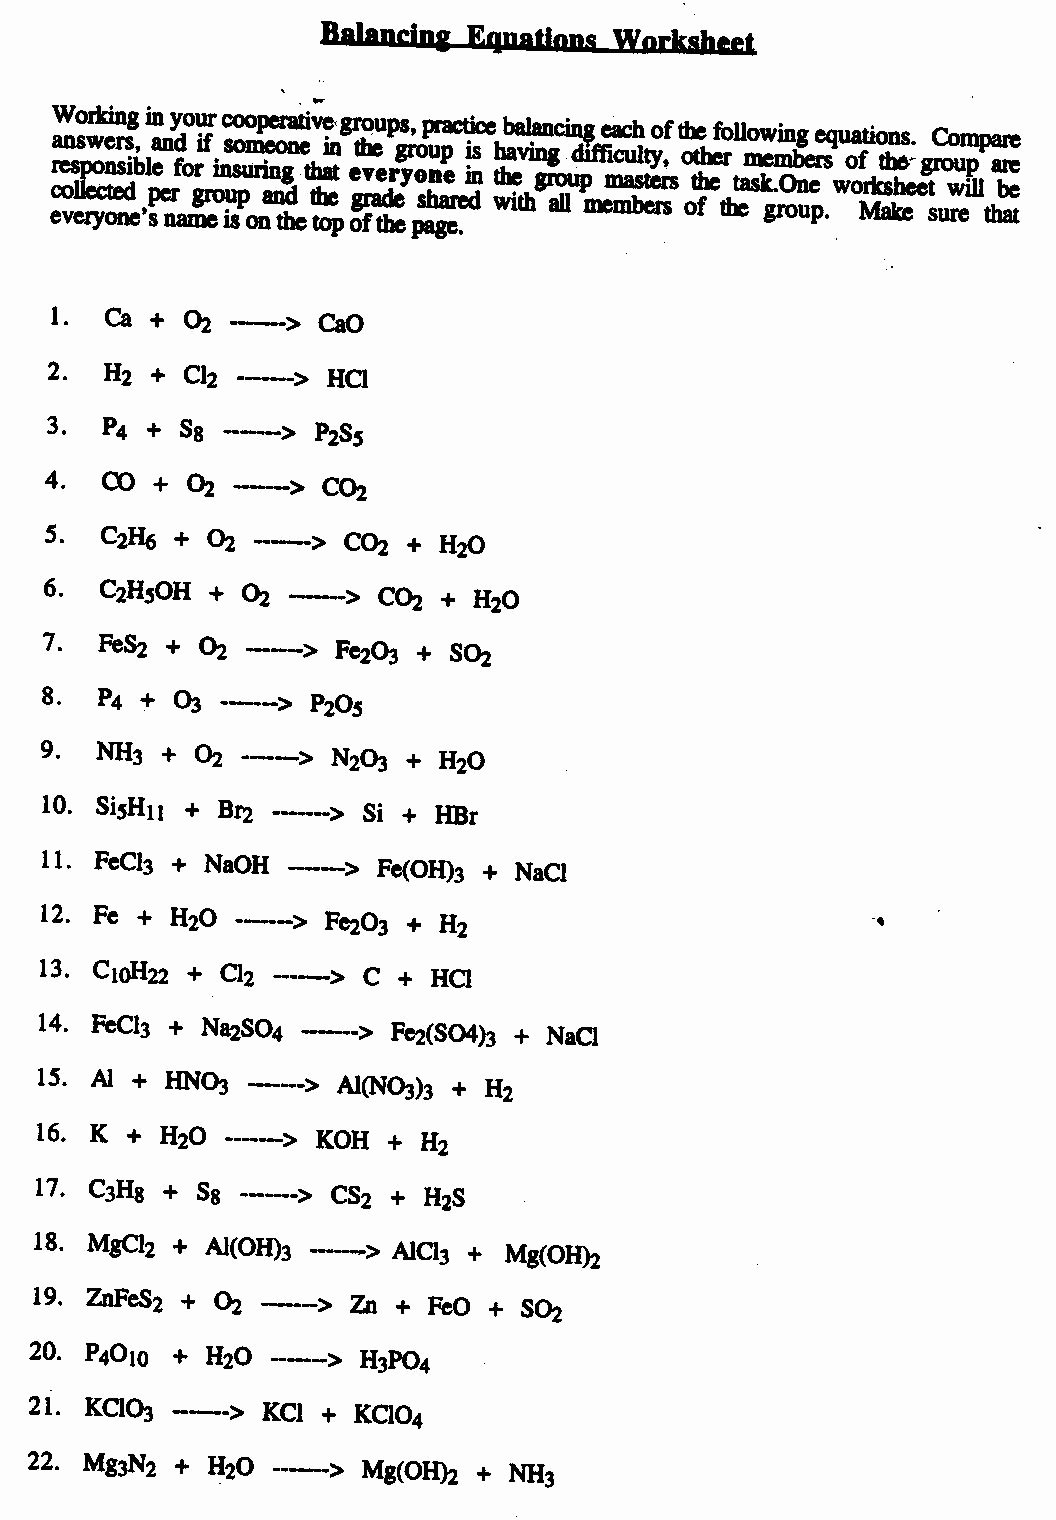 Balancing Chemical Equations Worksheet Answers Best Of 12 Best Of Types Chemical Reactions Worksheet